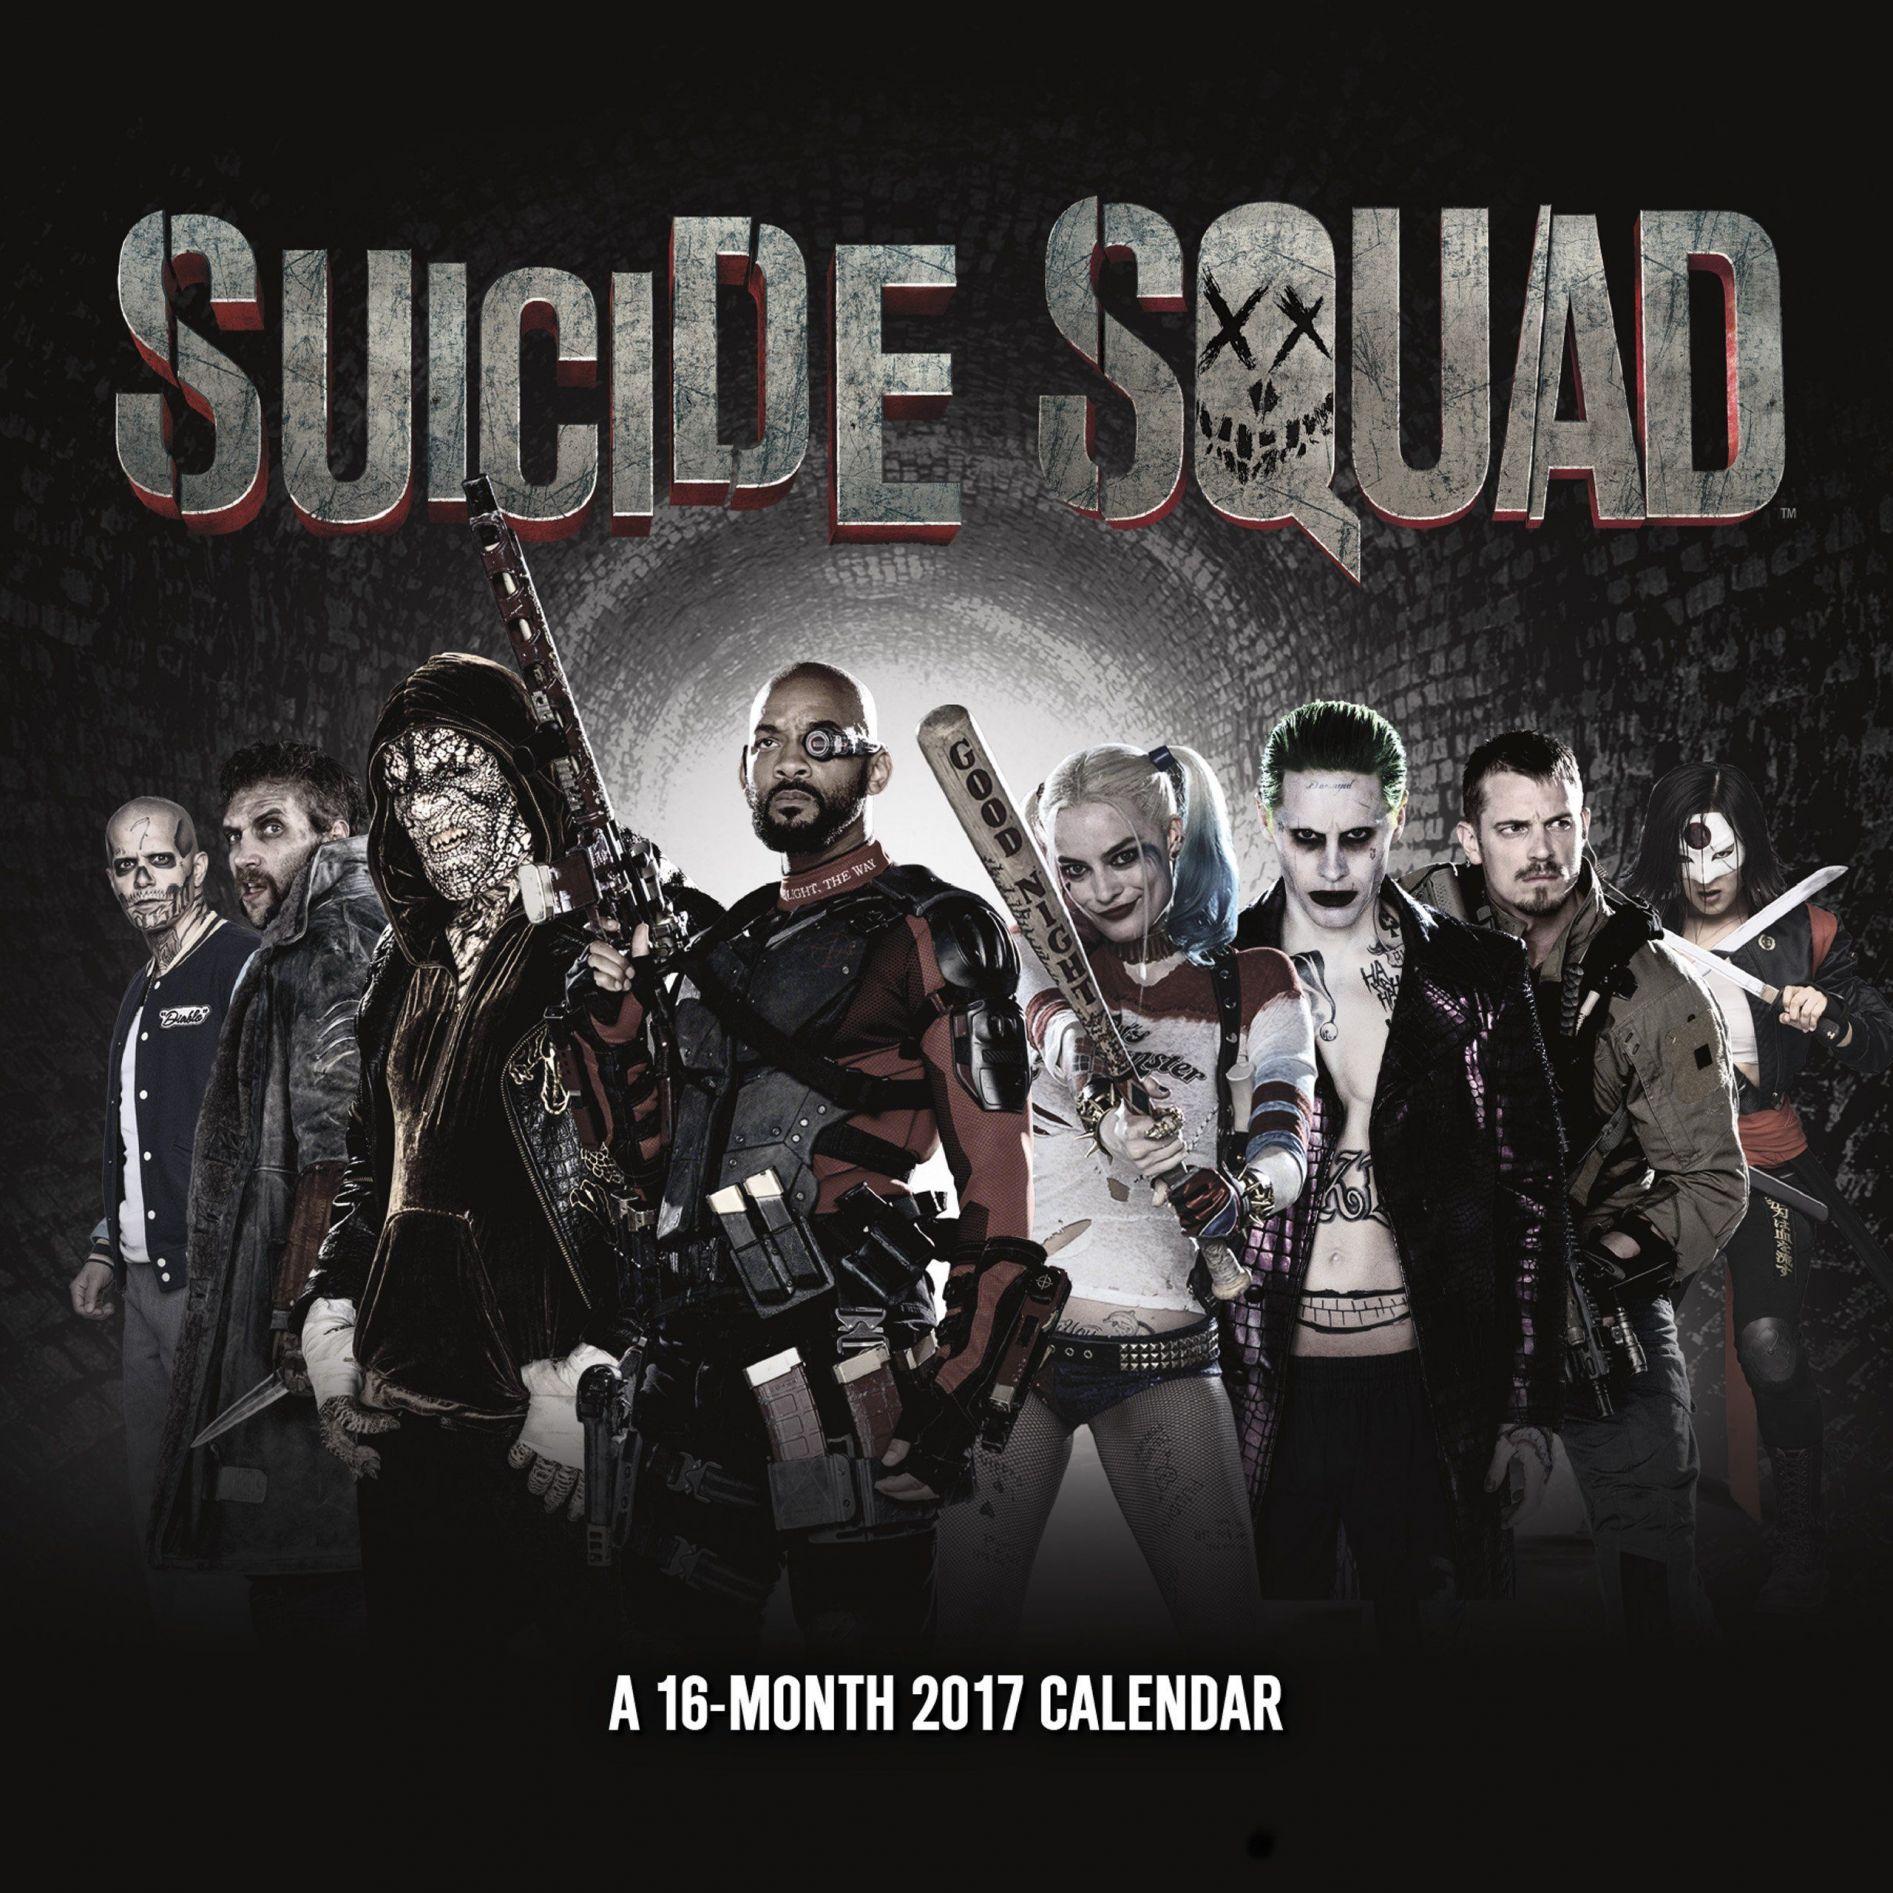 Suicide Squad Meme Template